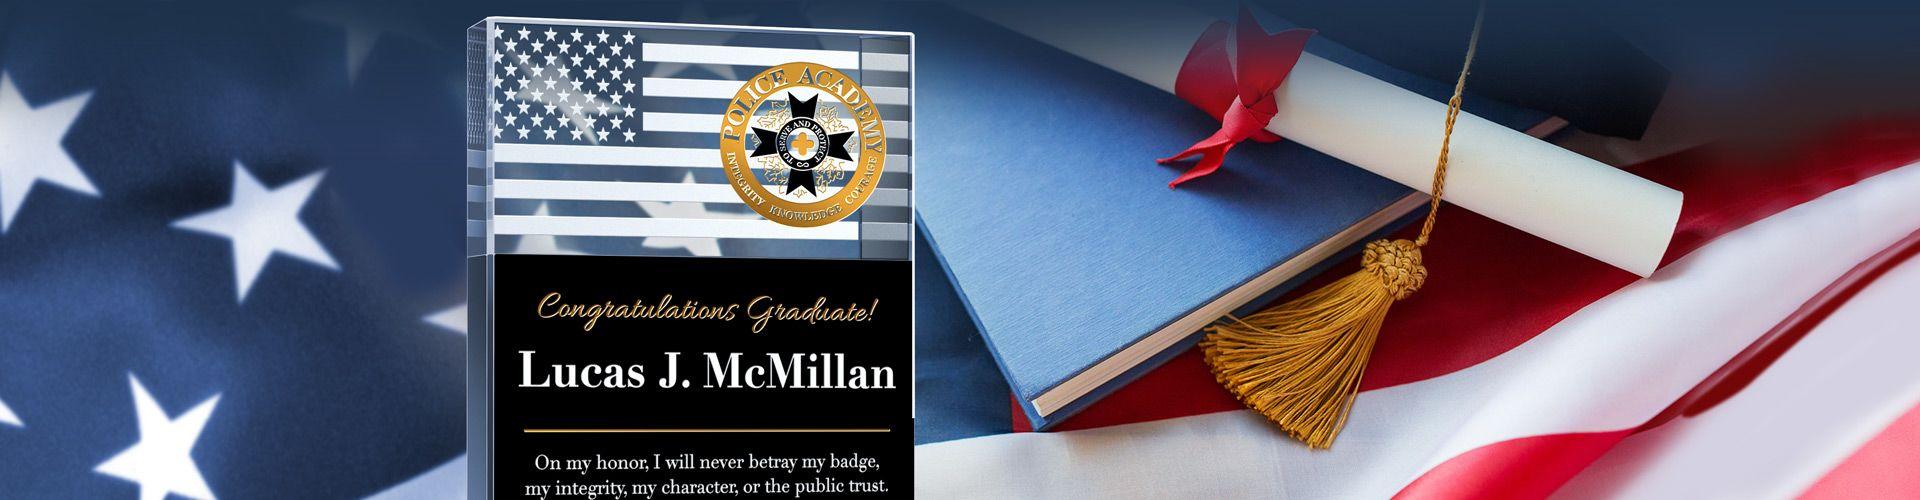 Custom Police Academy Graduation Award Plaques - Banner 1